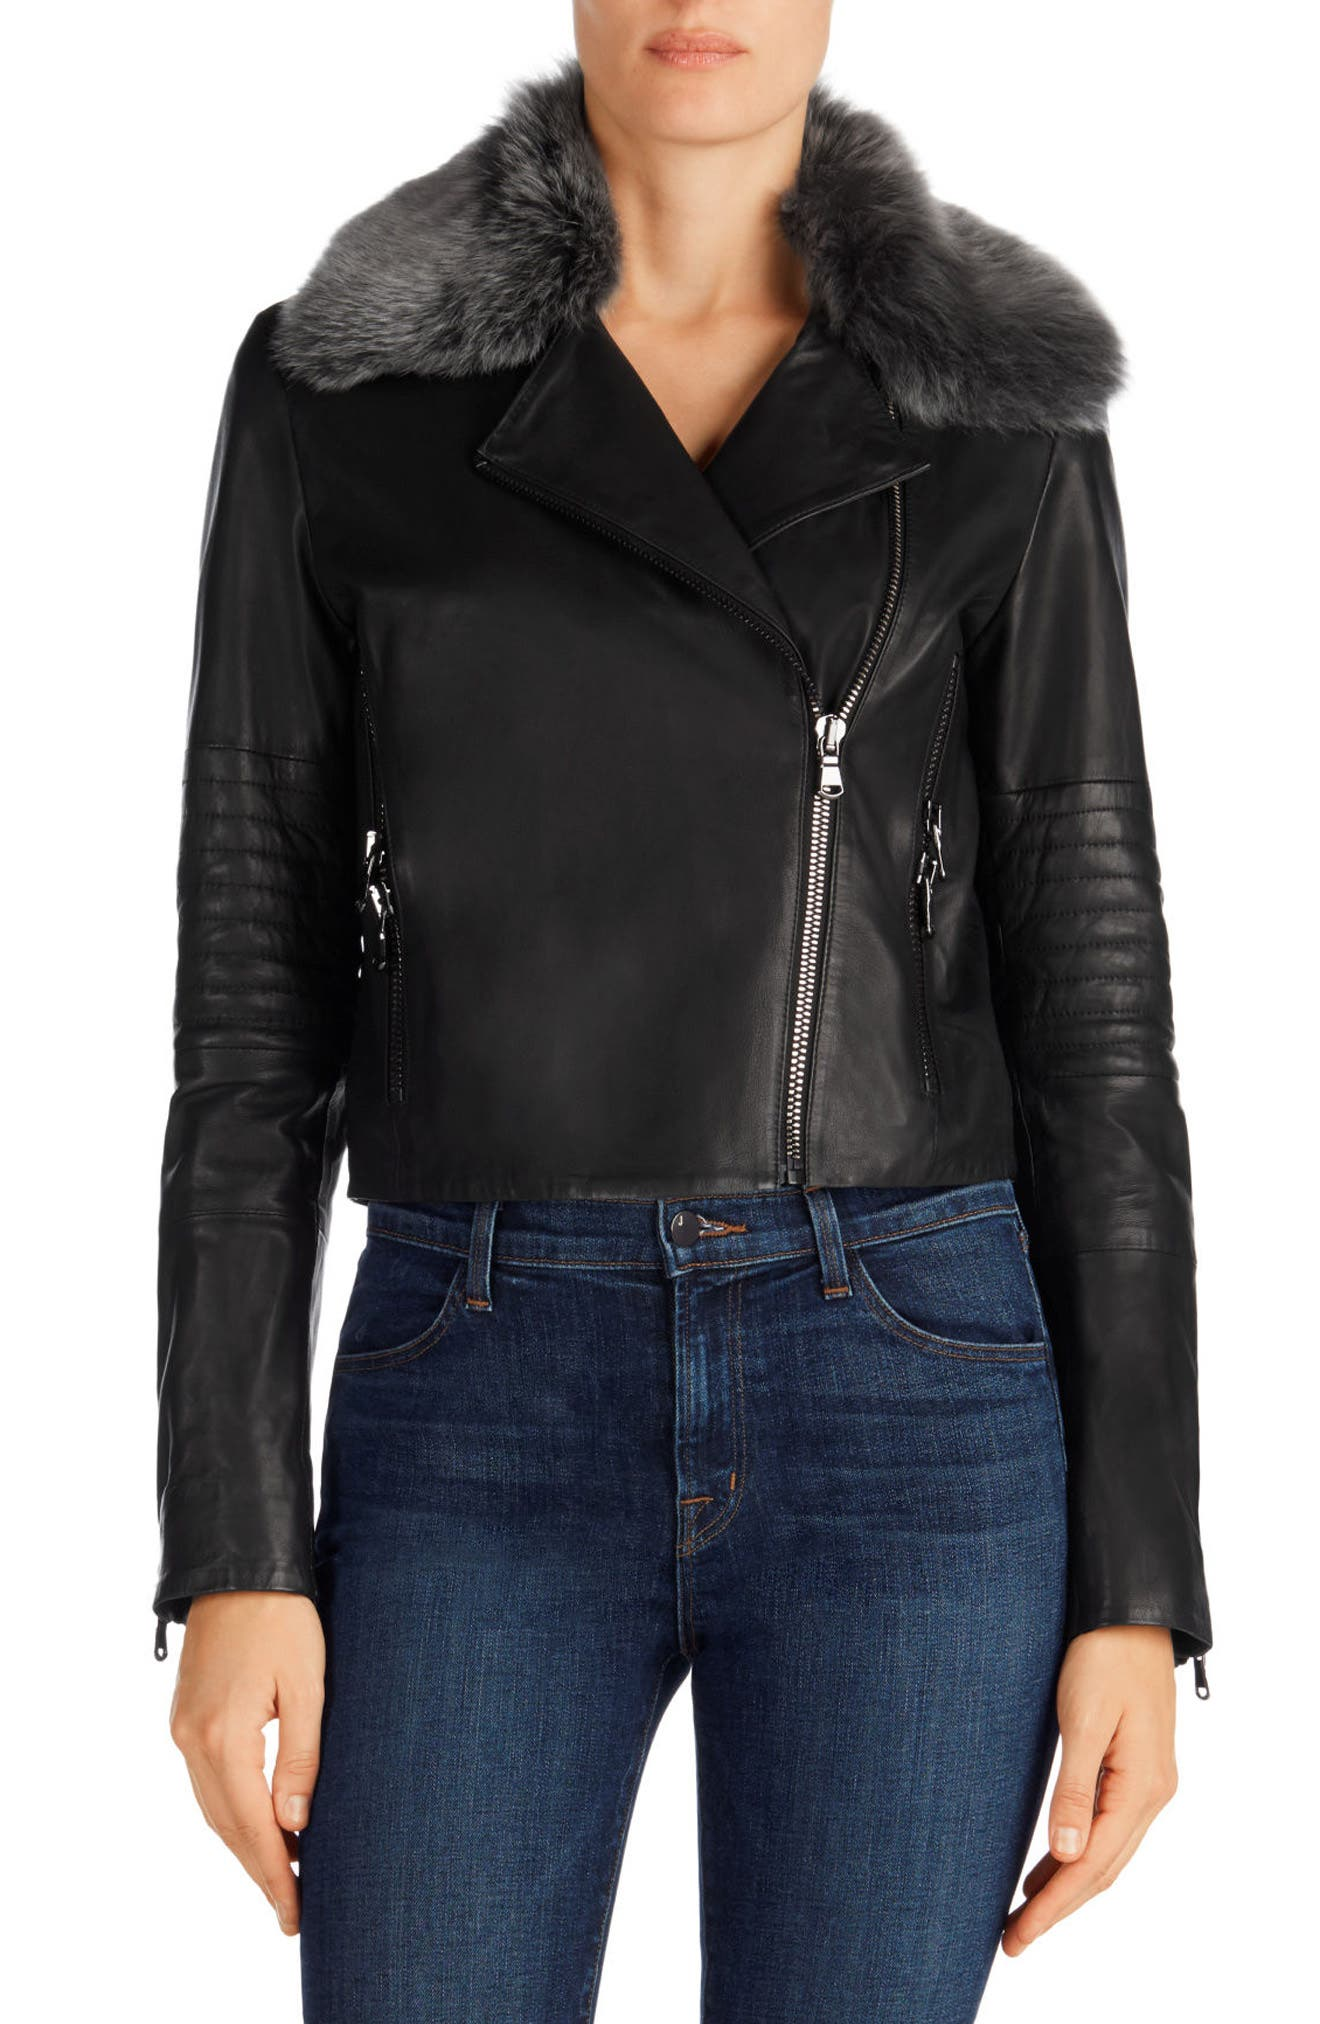 Aiah Leather Moto Jacket with Detachable Lamb Shearling Collar,                             Main thumbnail 1, color,                             001